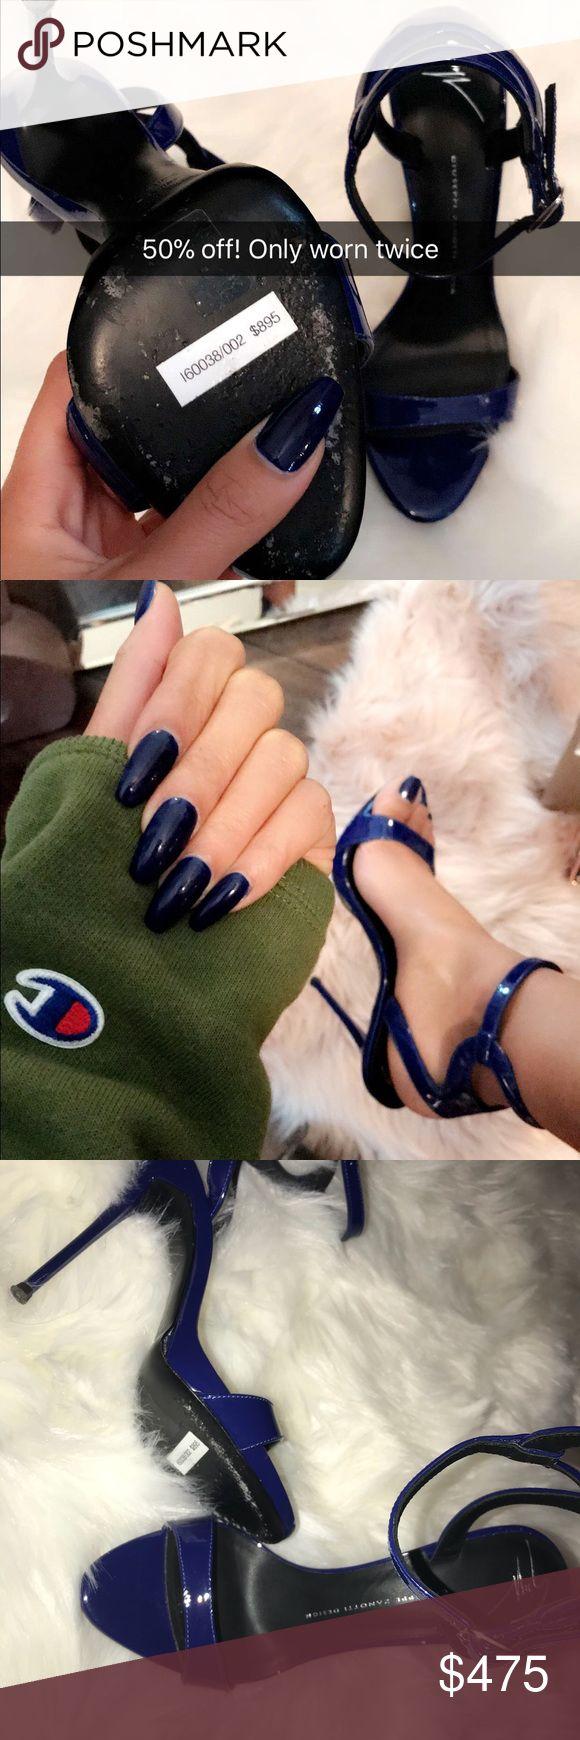 Giuseppe Zanotti Design Giuseppe Zanotti Sculpted Blue Patent Sandals Giuseppe Zanotti Shoes Heels